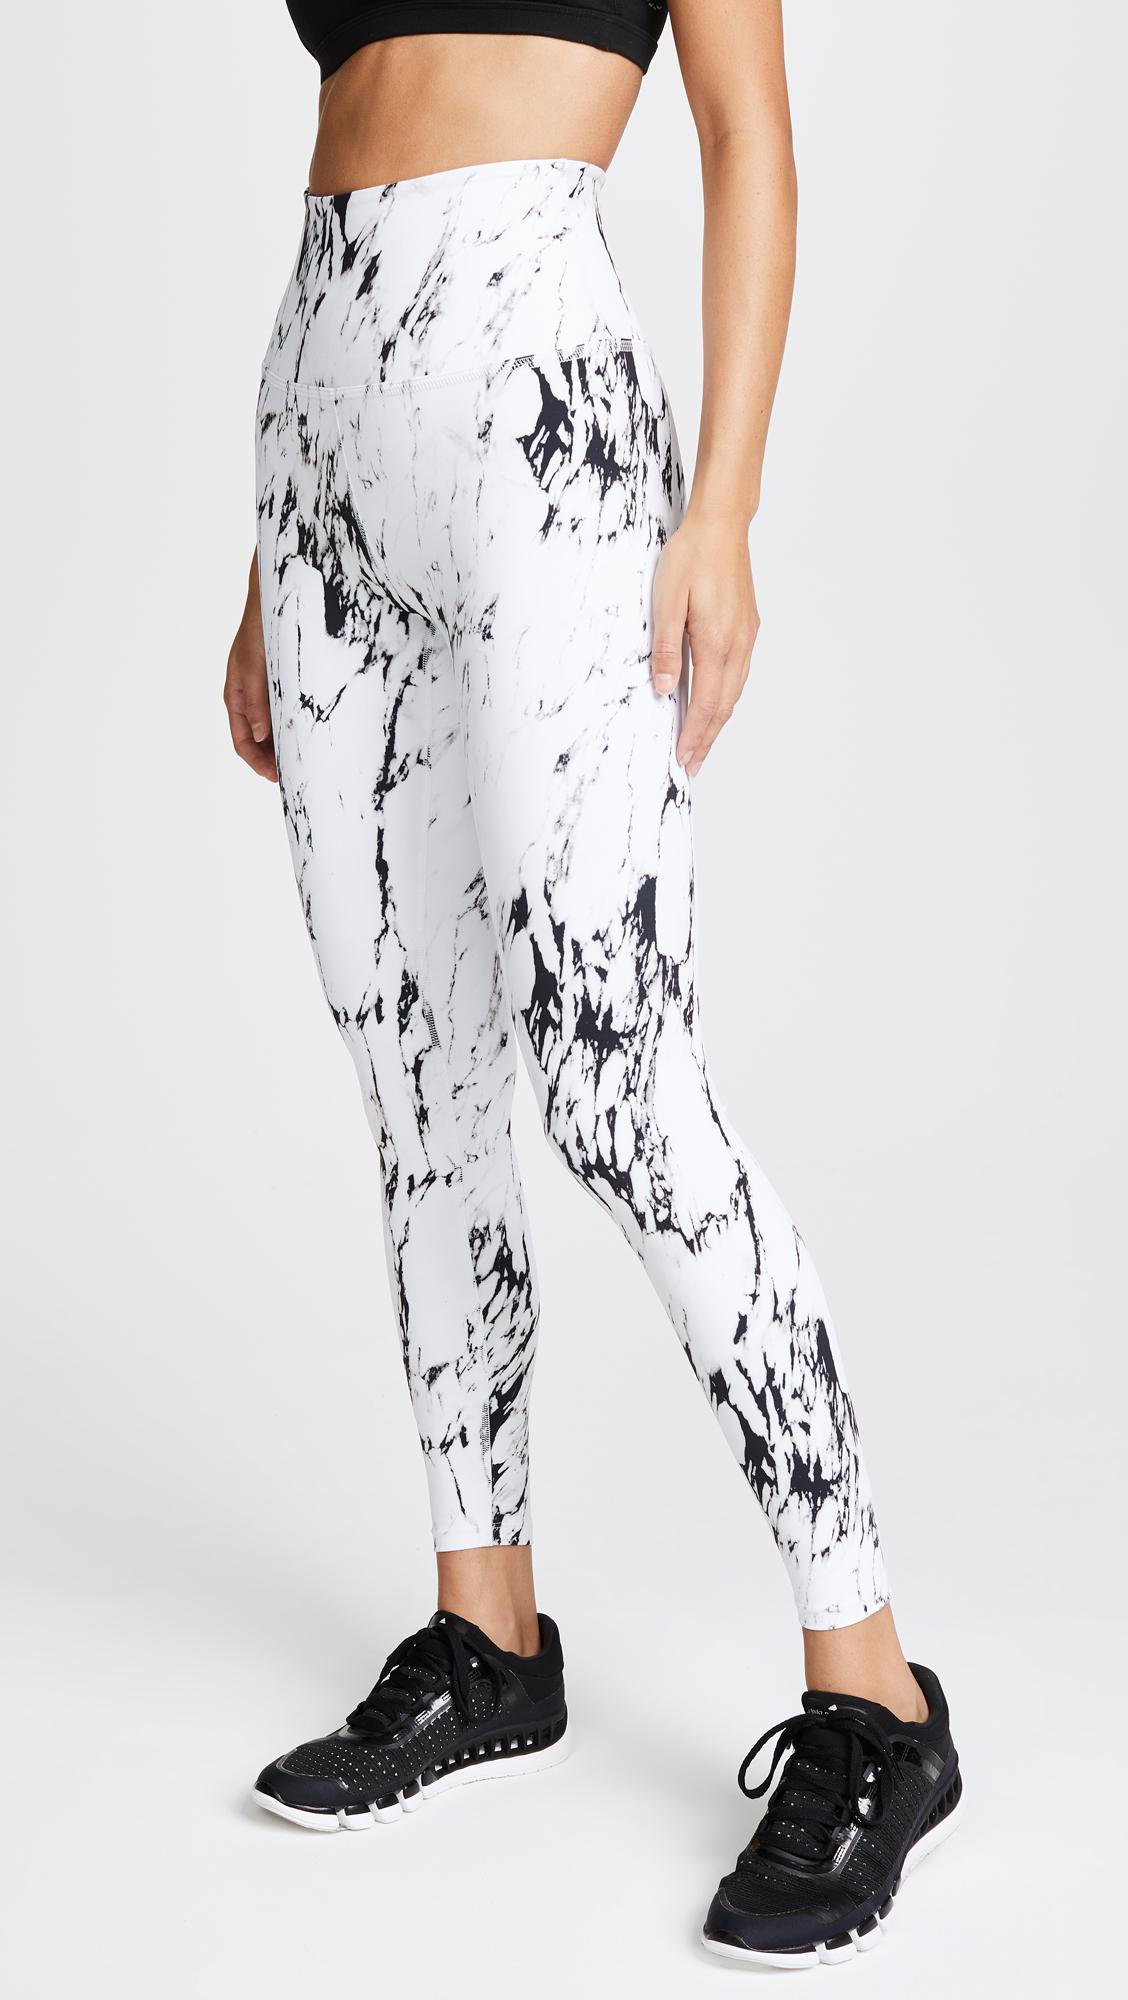 f8394a2c03f6d Beyond Yoga Olympus Leggings in White - Lyst